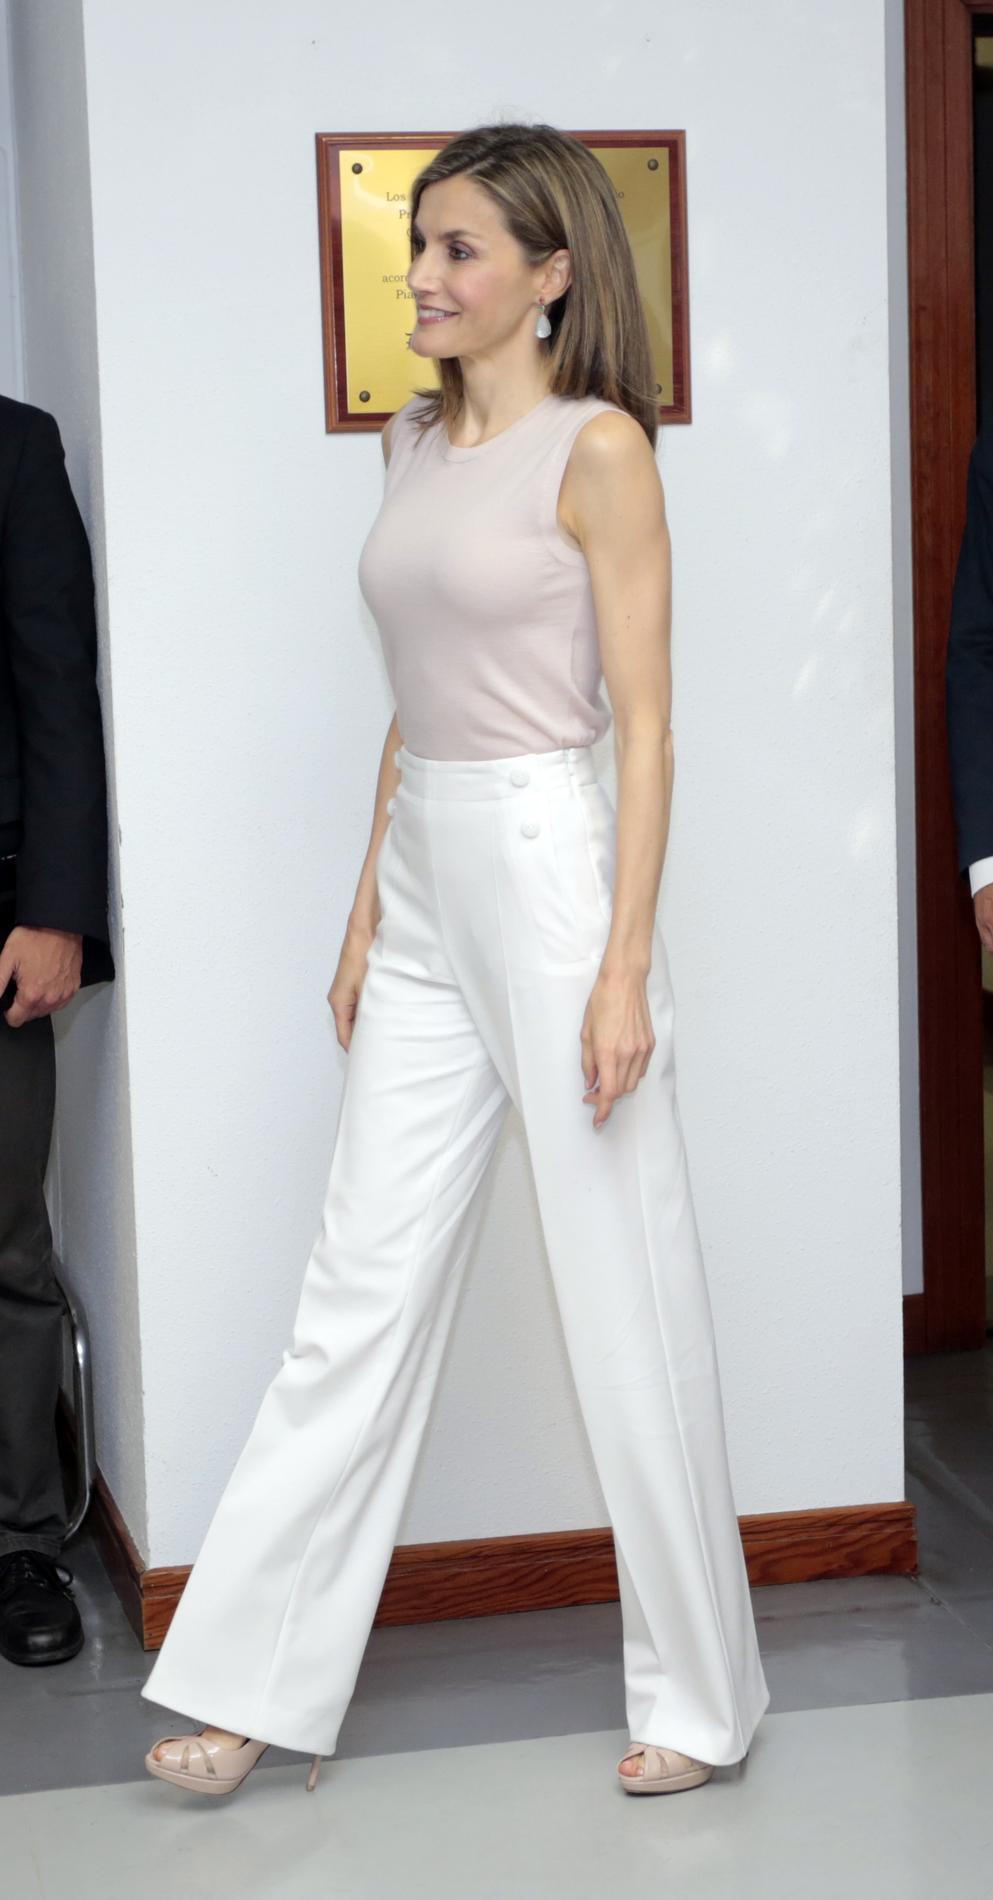 Porter Figaro Comment Le BlancMadame Pantalon UMSqpzV